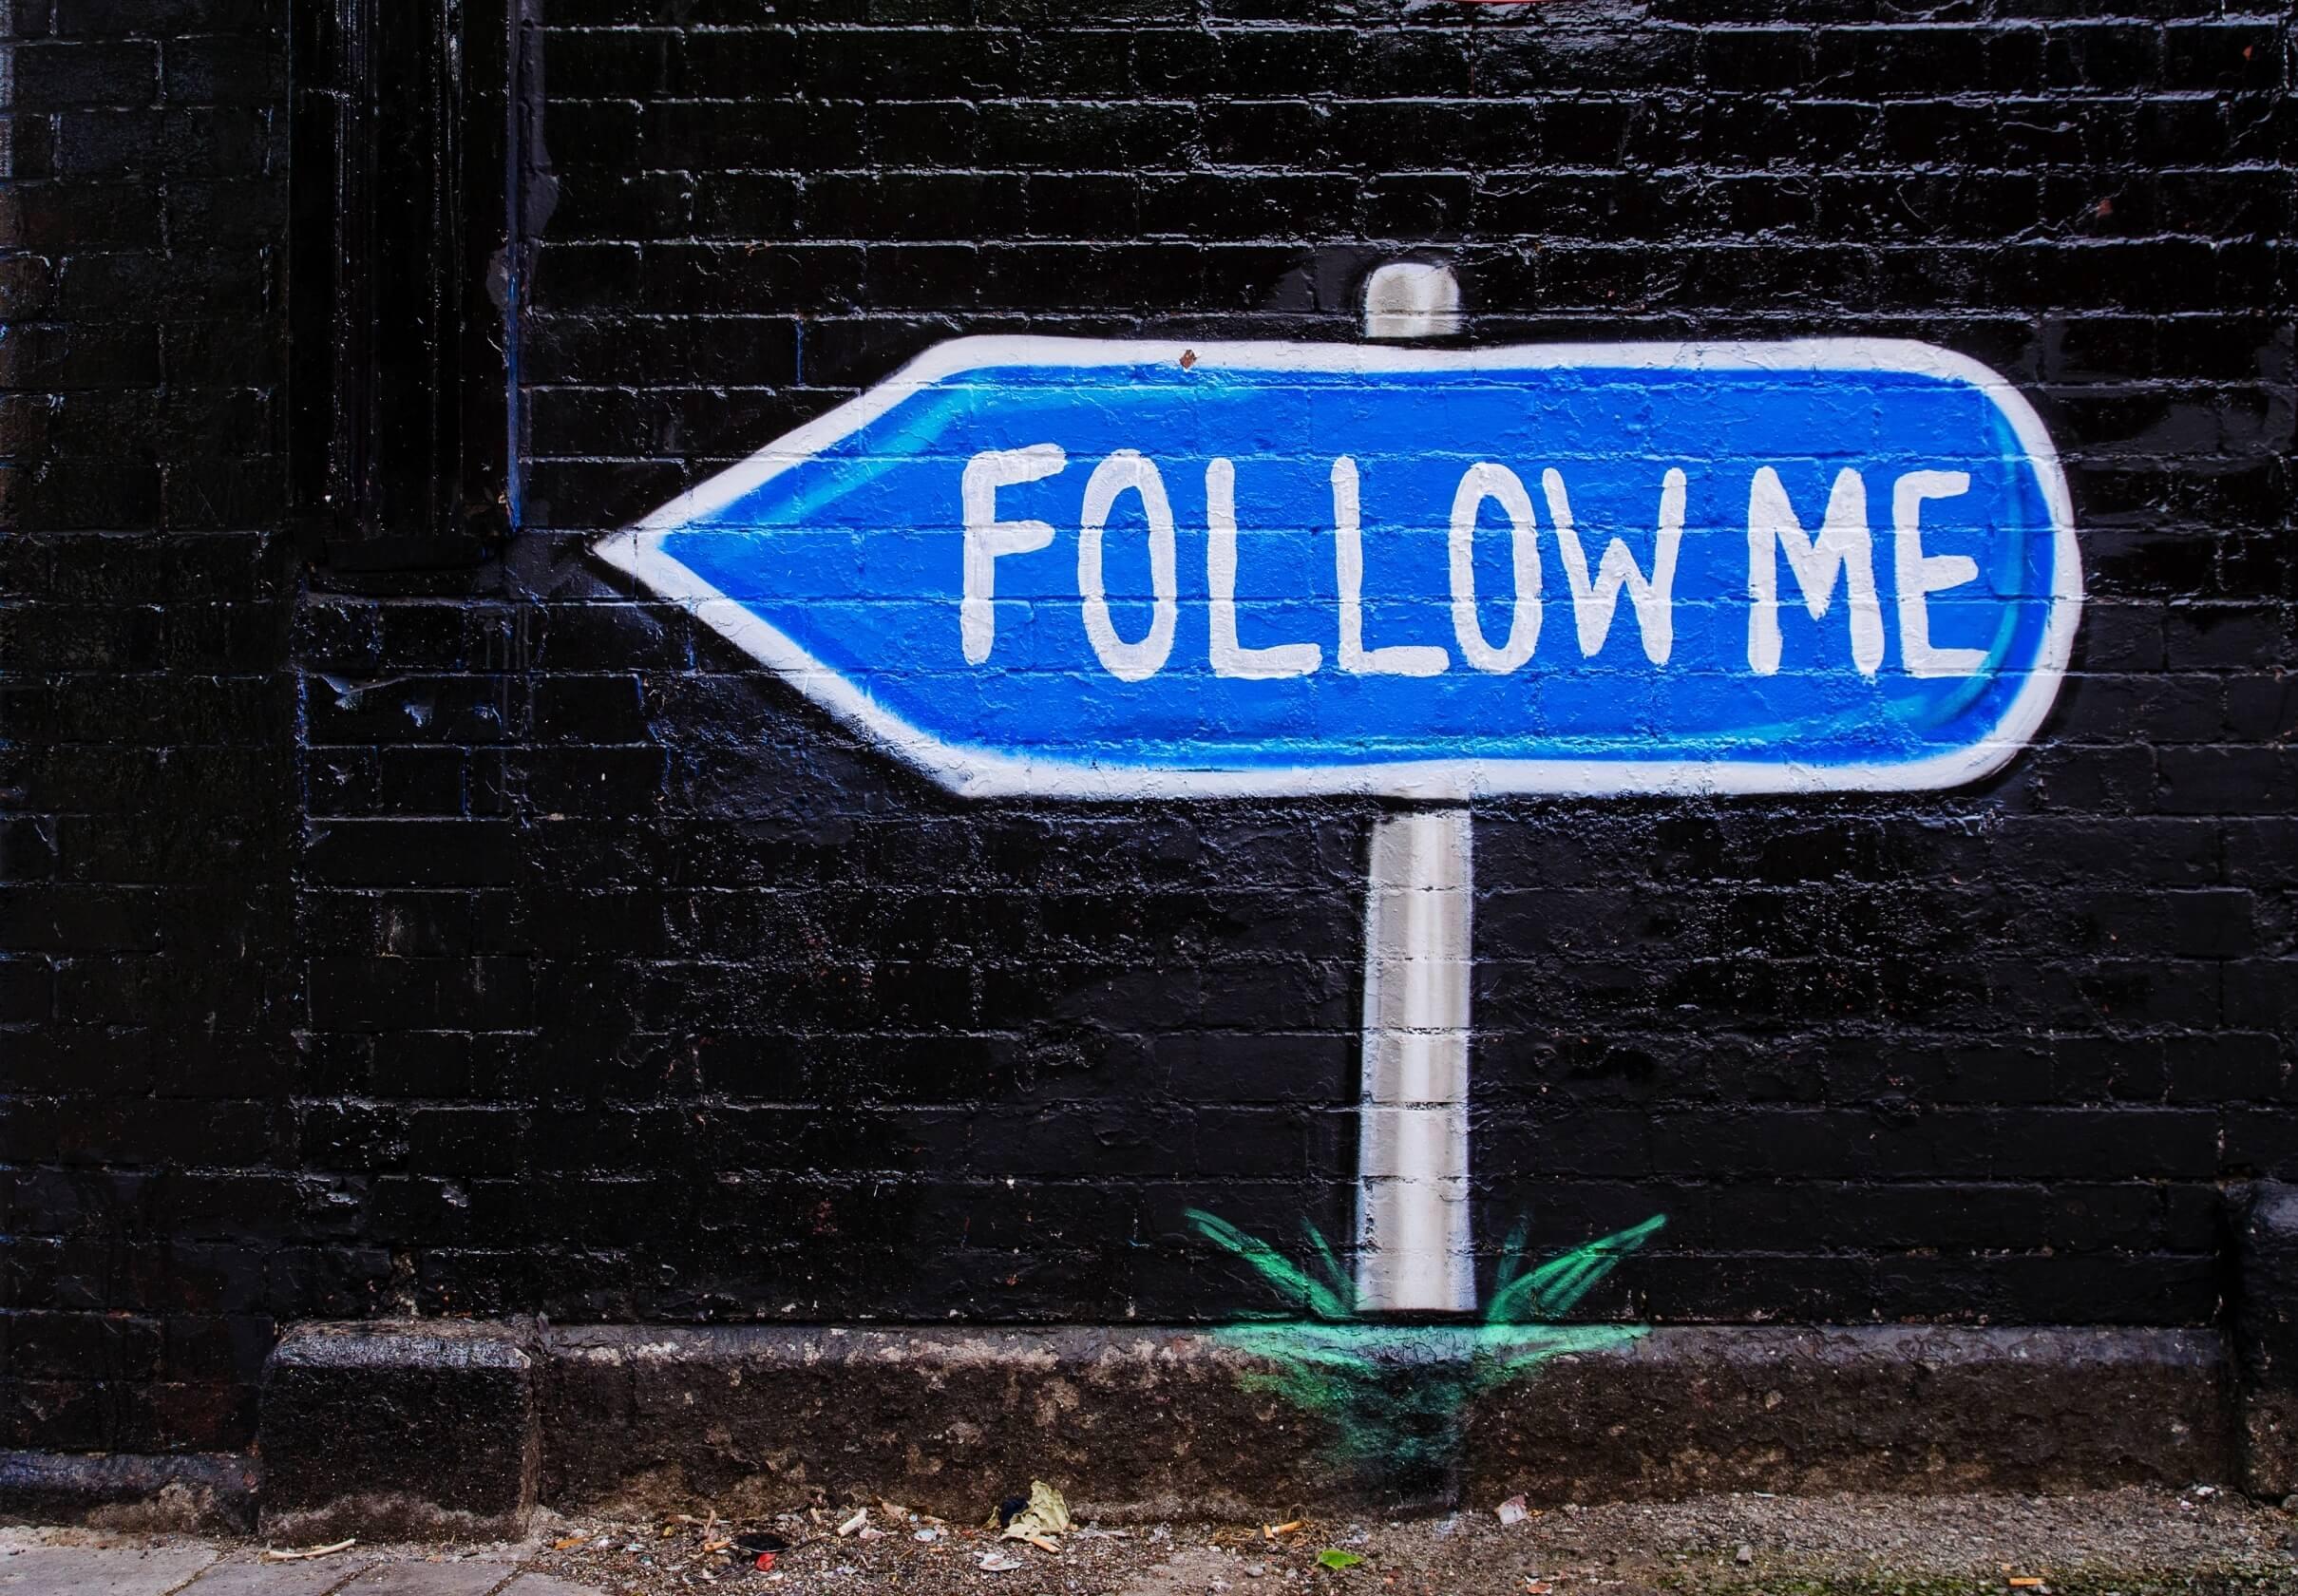 Follow me roadsign on black brick wall